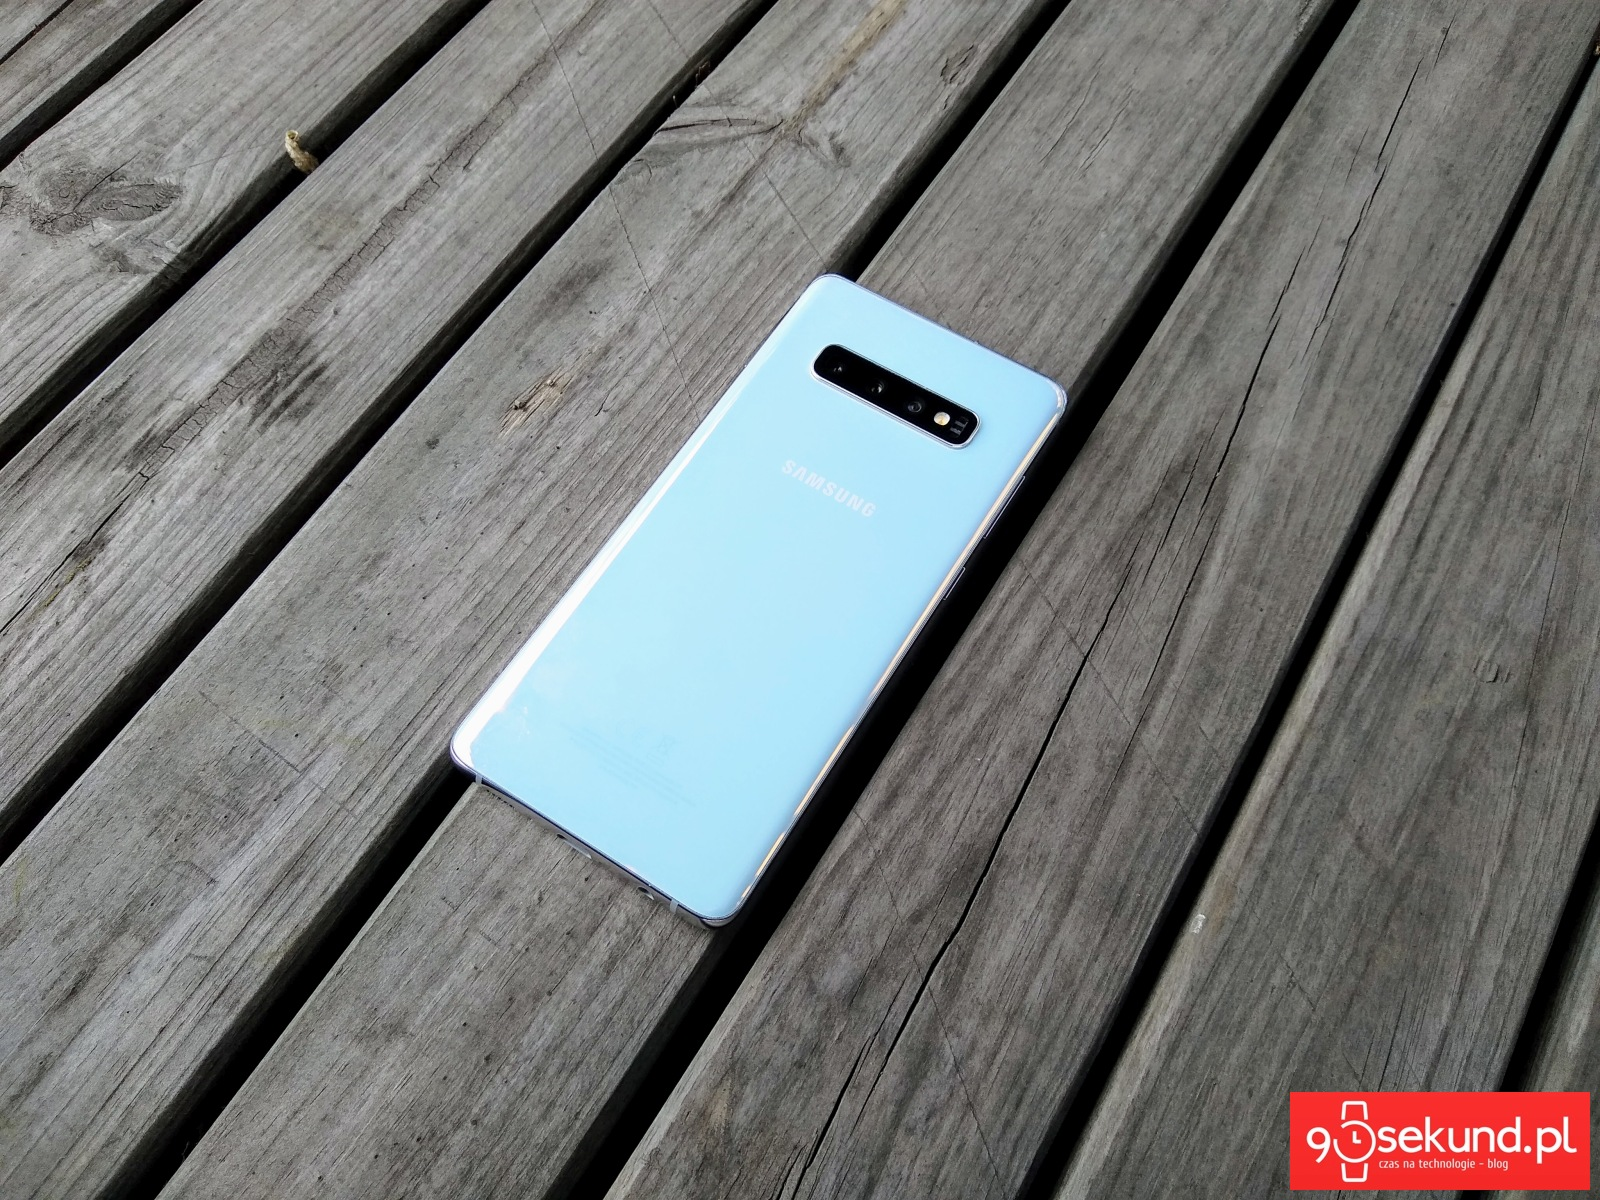 Samsung Galaxy S10 Plus - Michał Brożyński 90sekund.pl